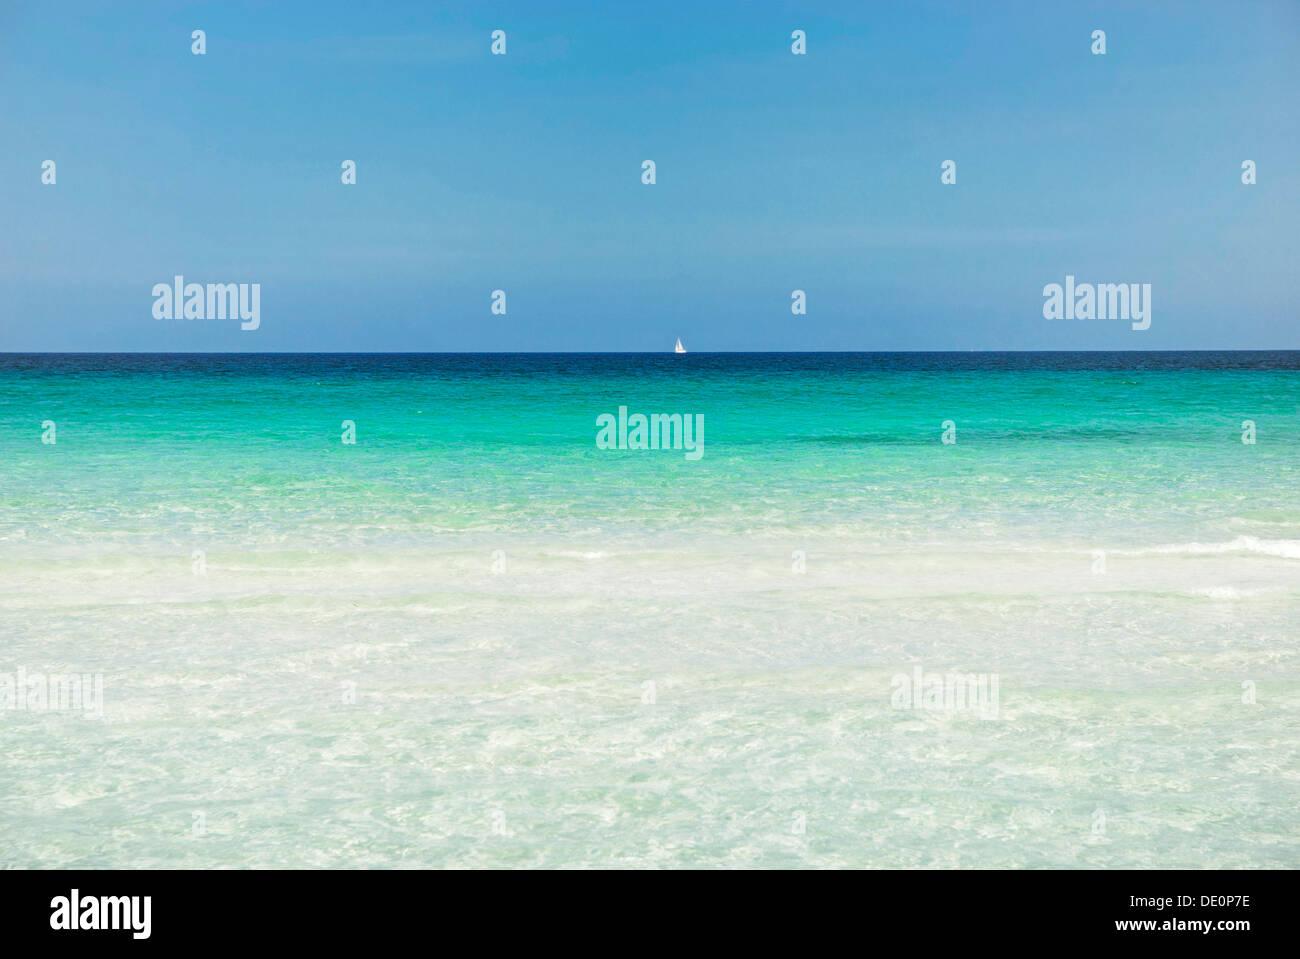 Horizont mit Segelschiff, türkisfarbenen Meer mit Sandstrand, La Cinta, Sardinien, Italien, Europa Stockbild